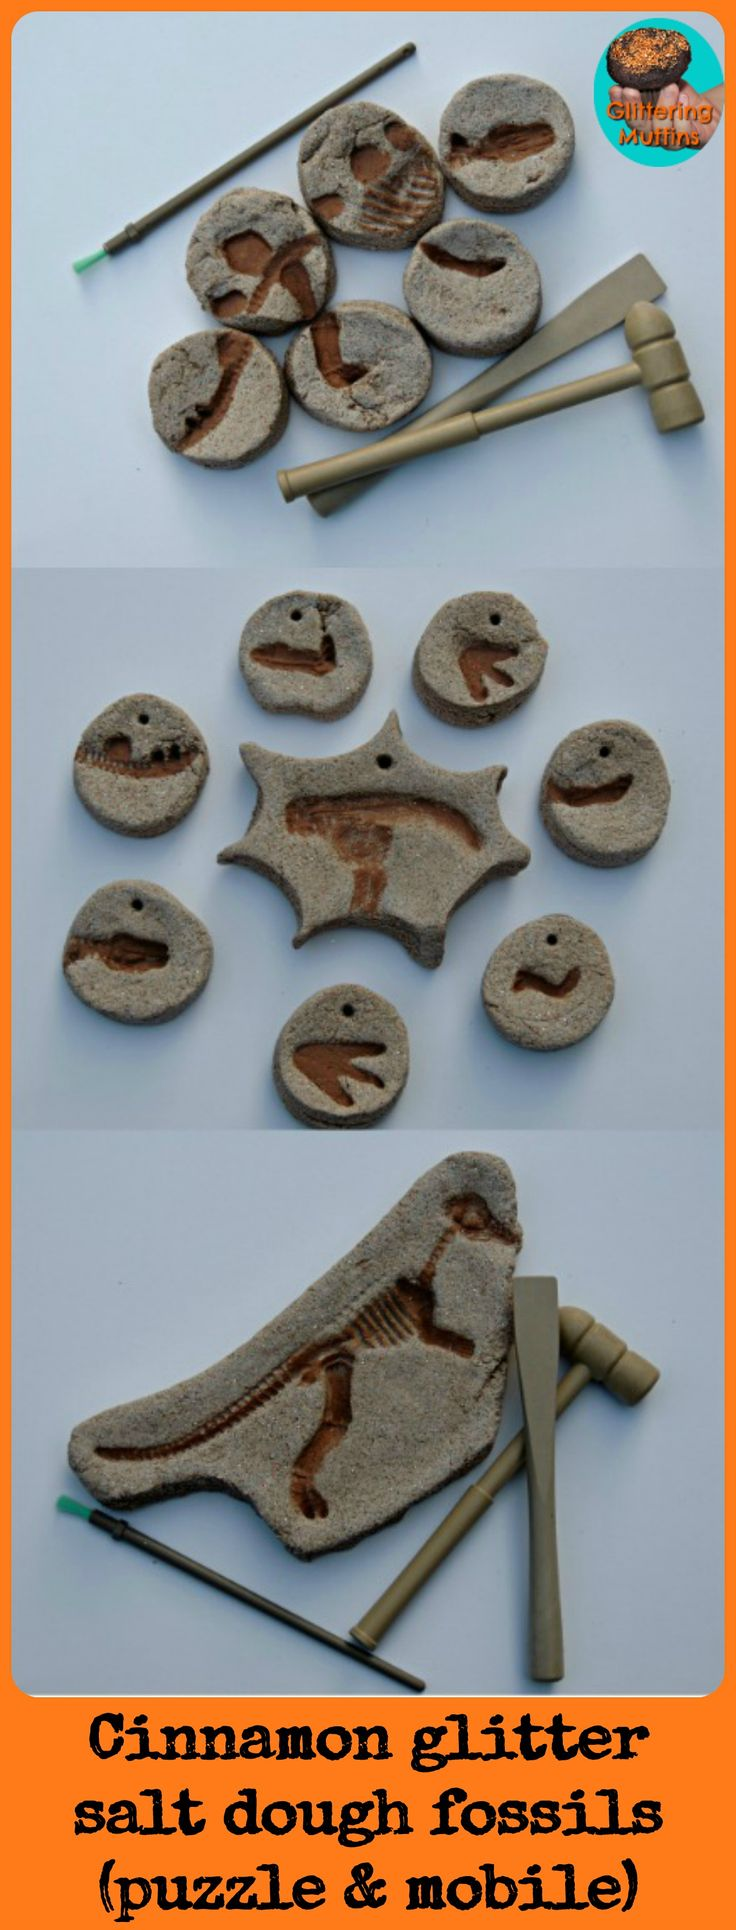 Cinnamon glitter salt dough fossils (puzzle & mobile)